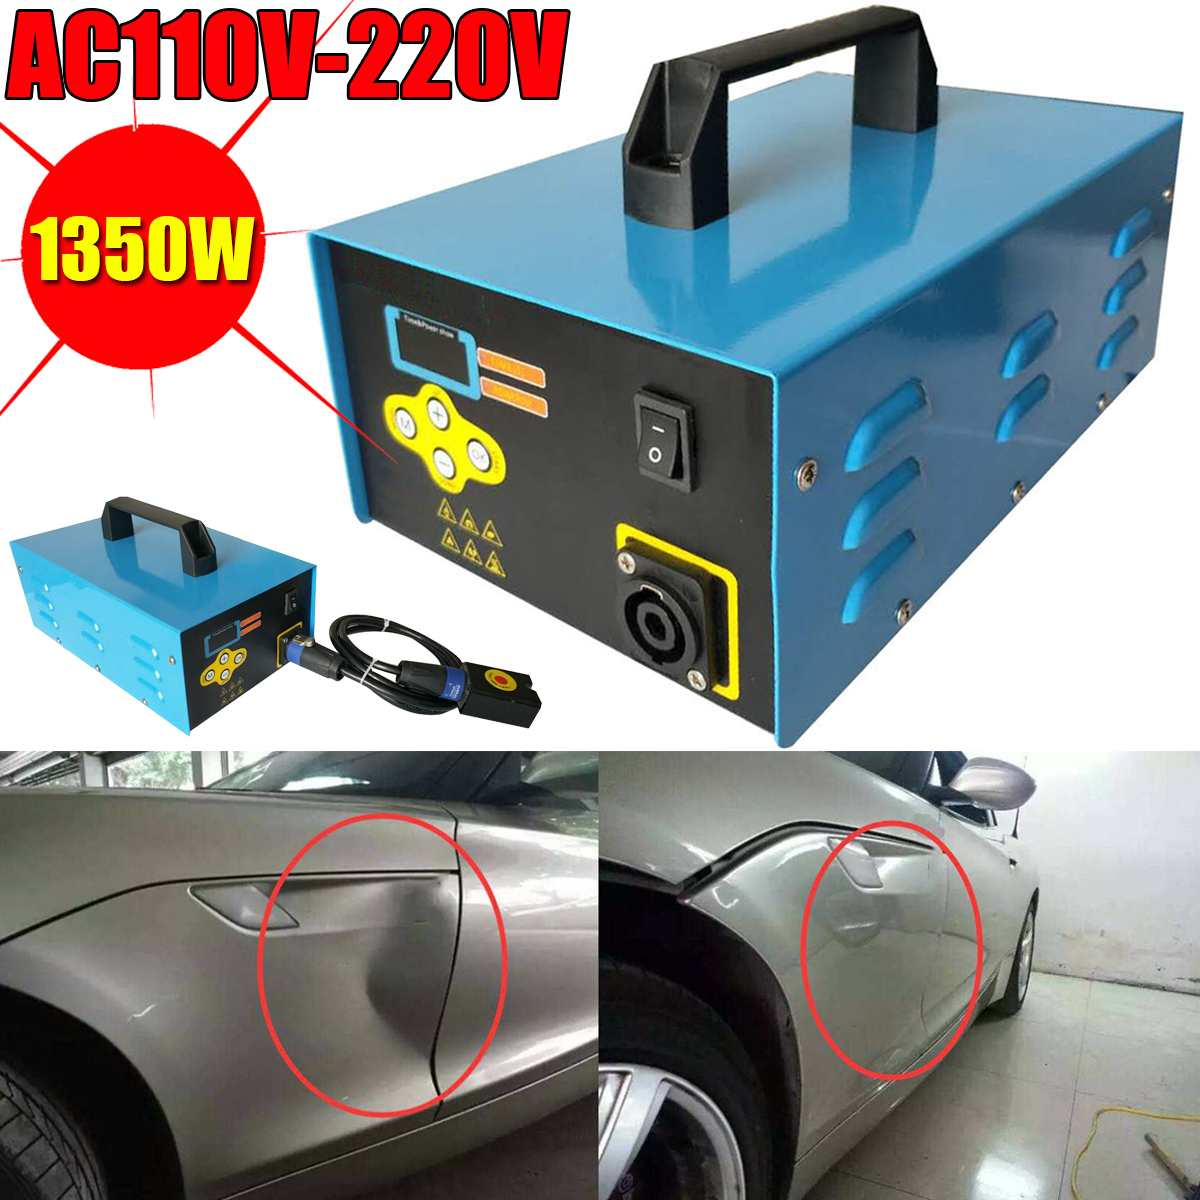 220V 1350W Car Paintless Dent Repair Remover Induction Heater Hot Box Carrosserie Reparation Dent Puller Car Dent Repair